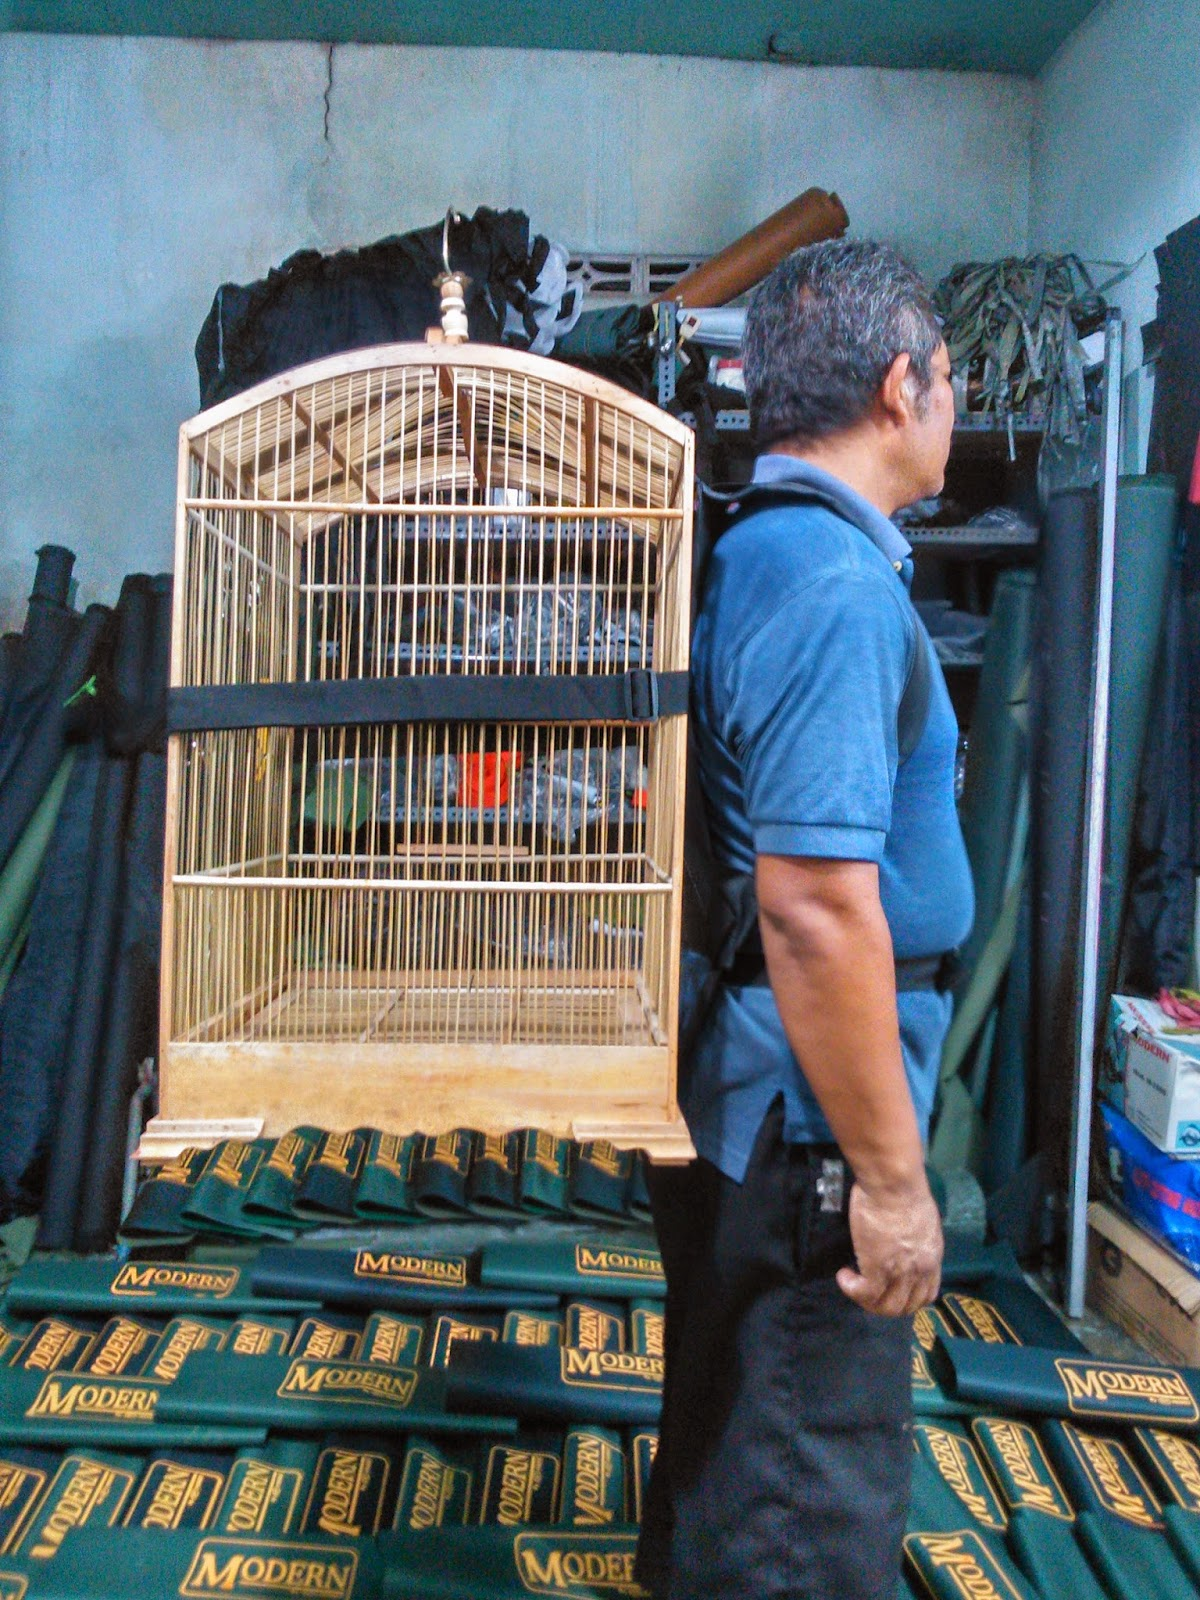 Tas Gendong Pembawa Sangkar Burung Kicau